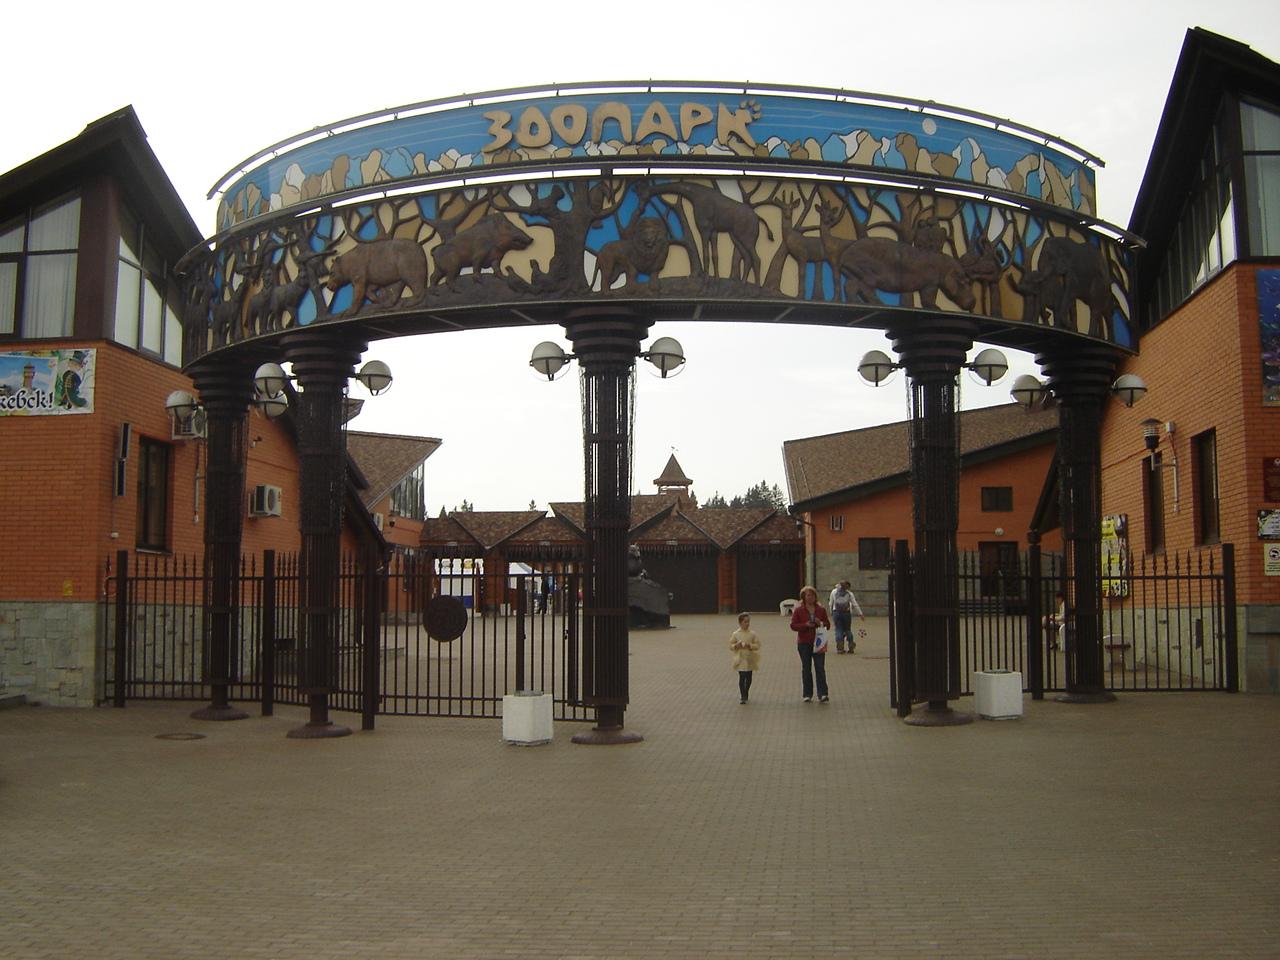 Файл:Зоопарк иж вход.JPG — Википедия